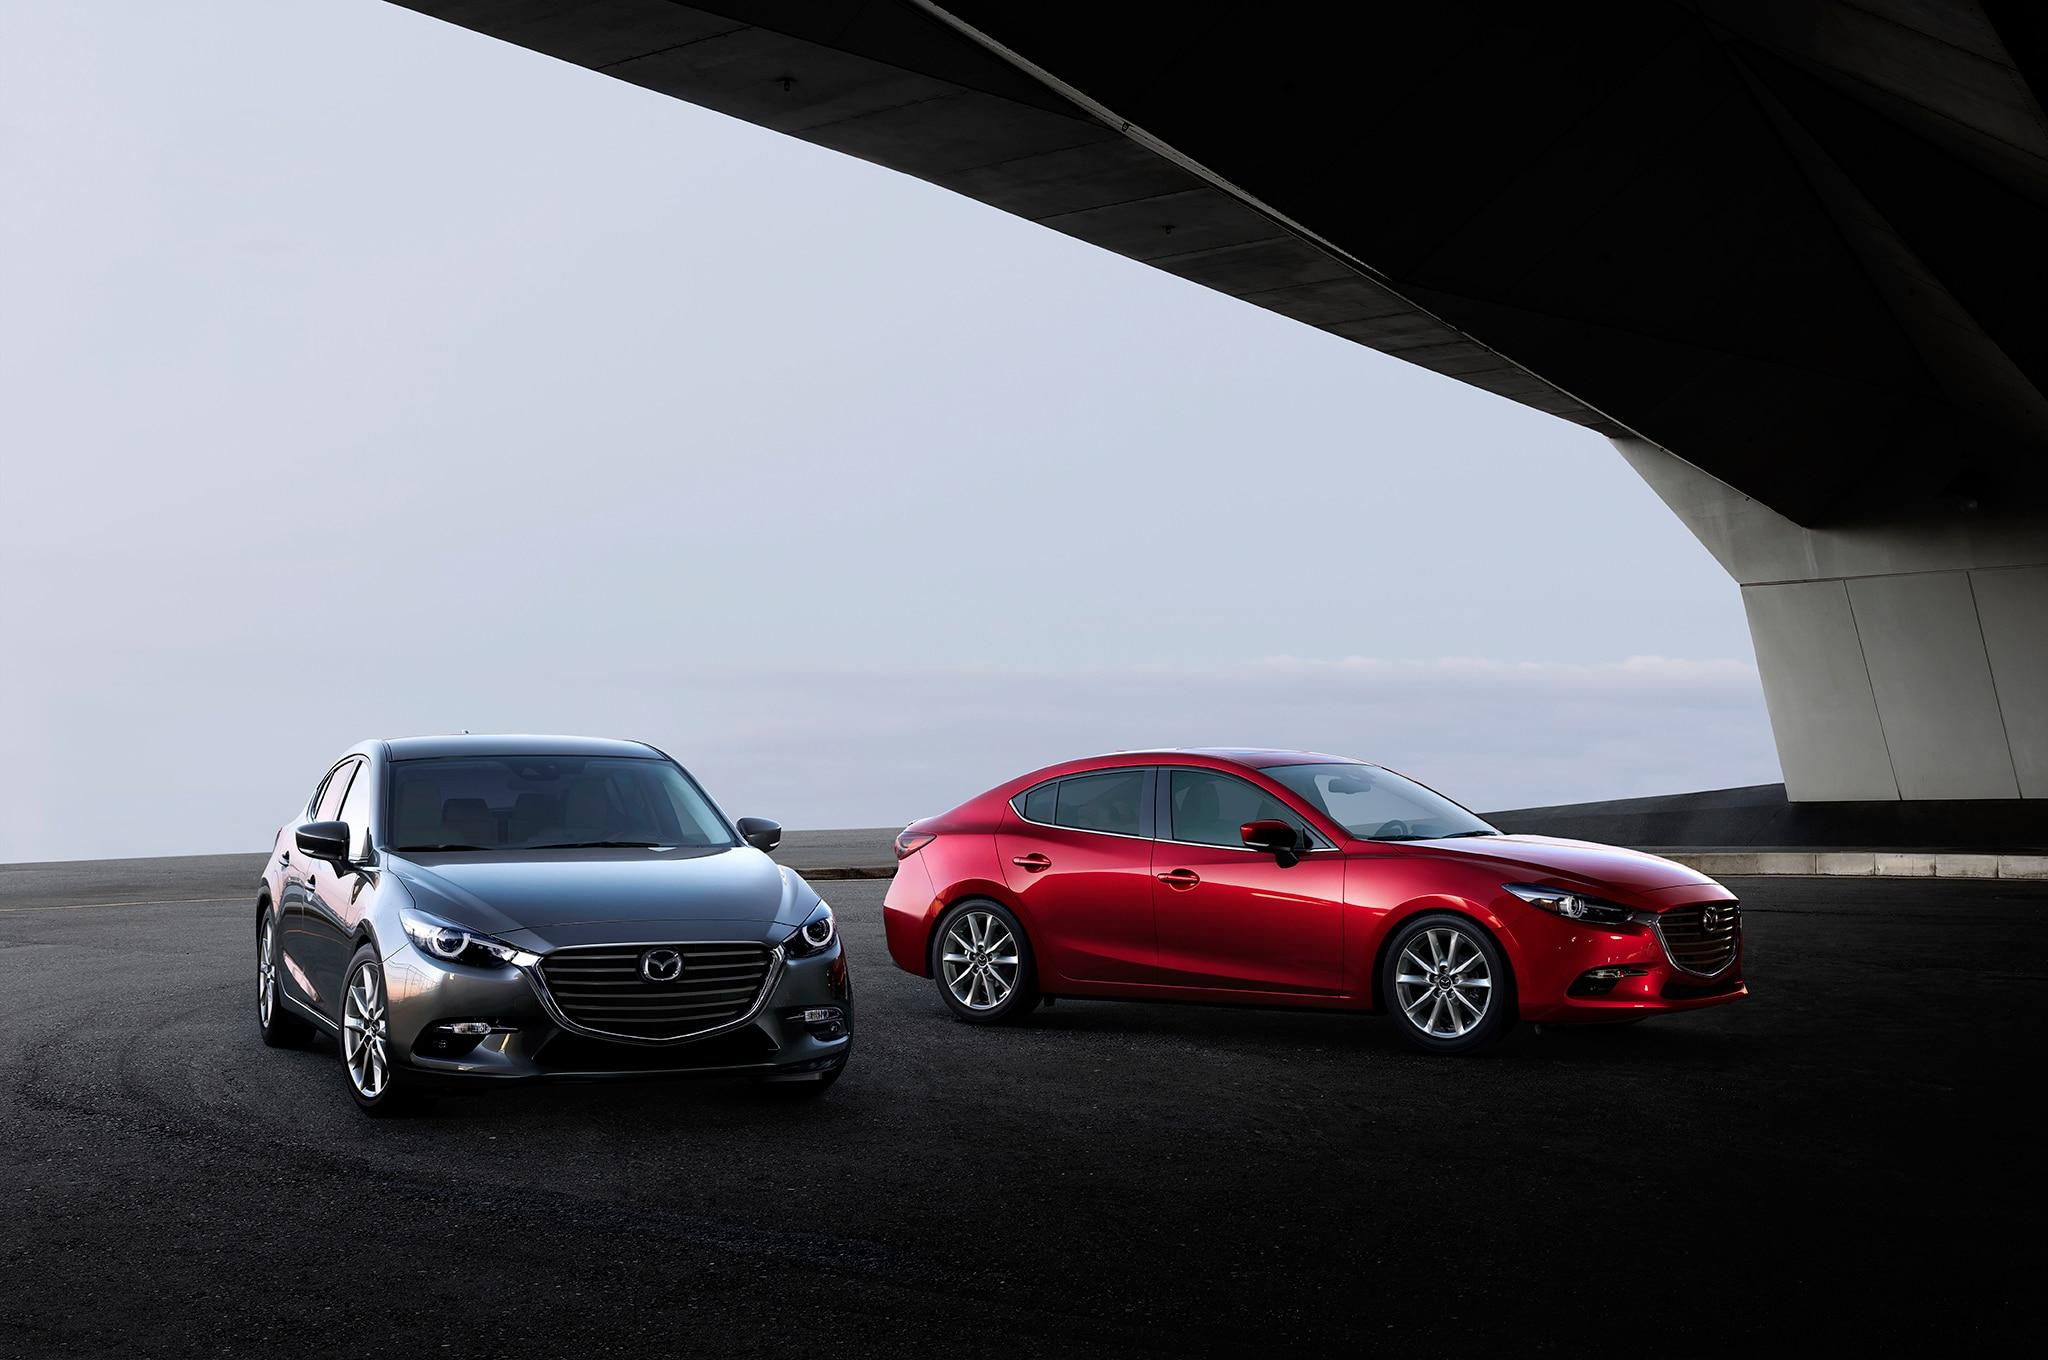 2017 Mazda3 Front End Three Quarter